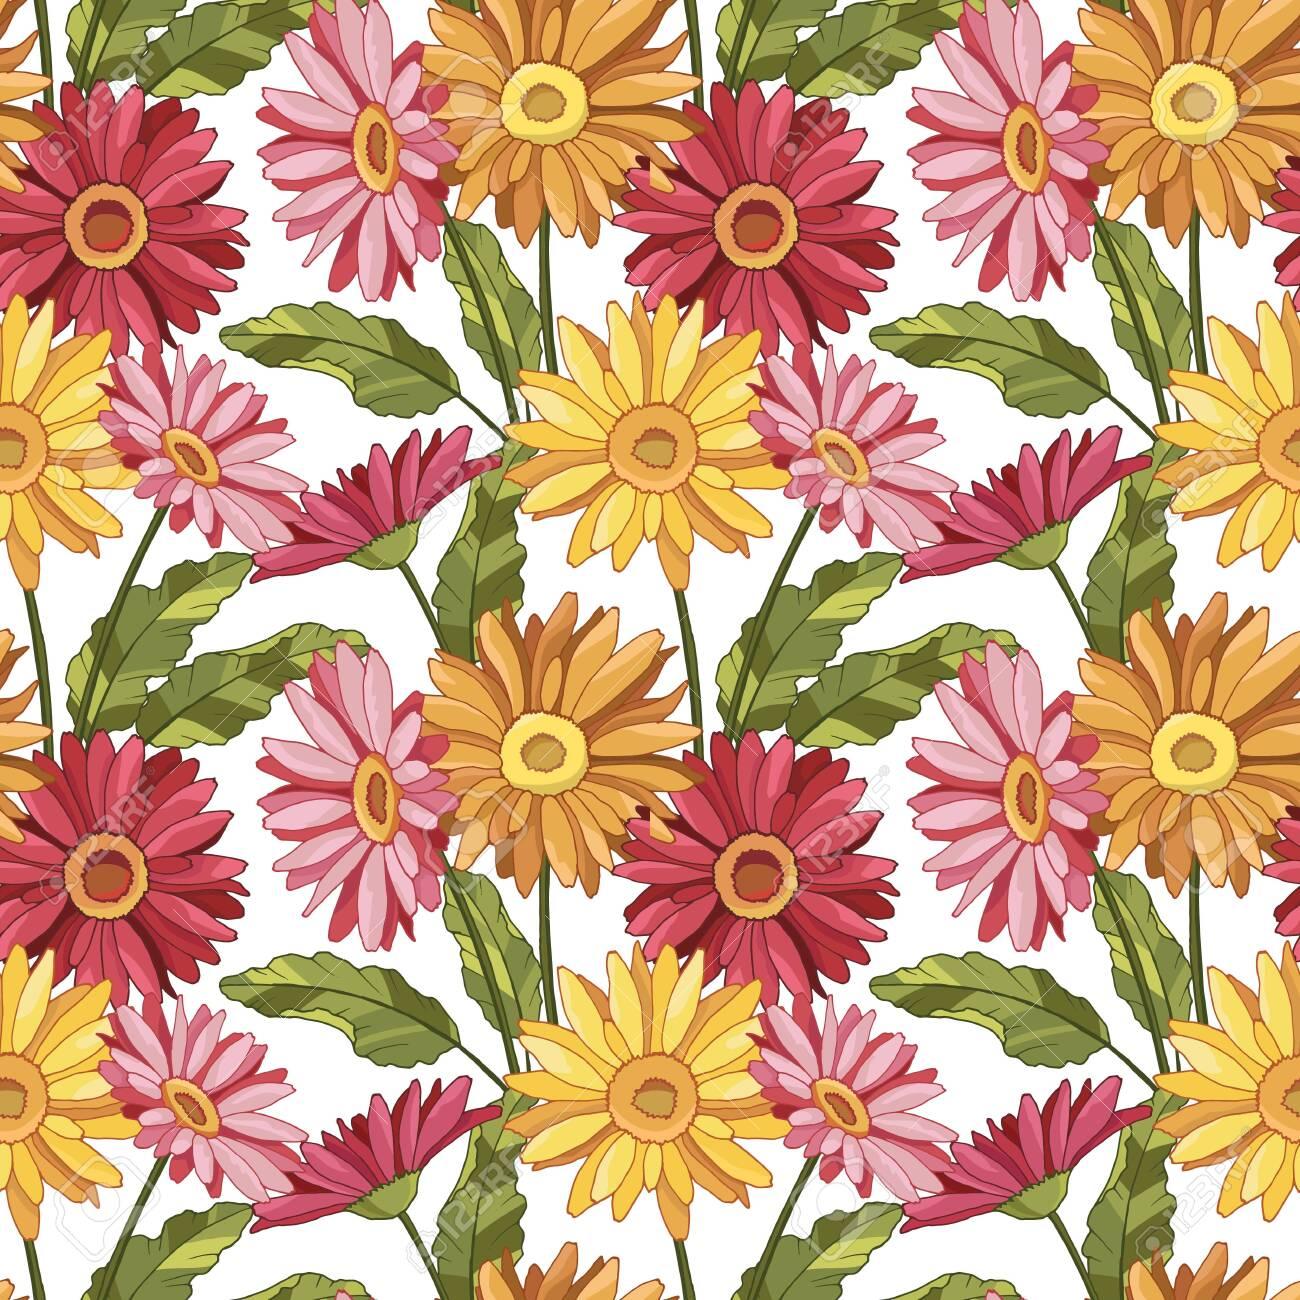 seamless pattern with gerbera flowers - 145148149